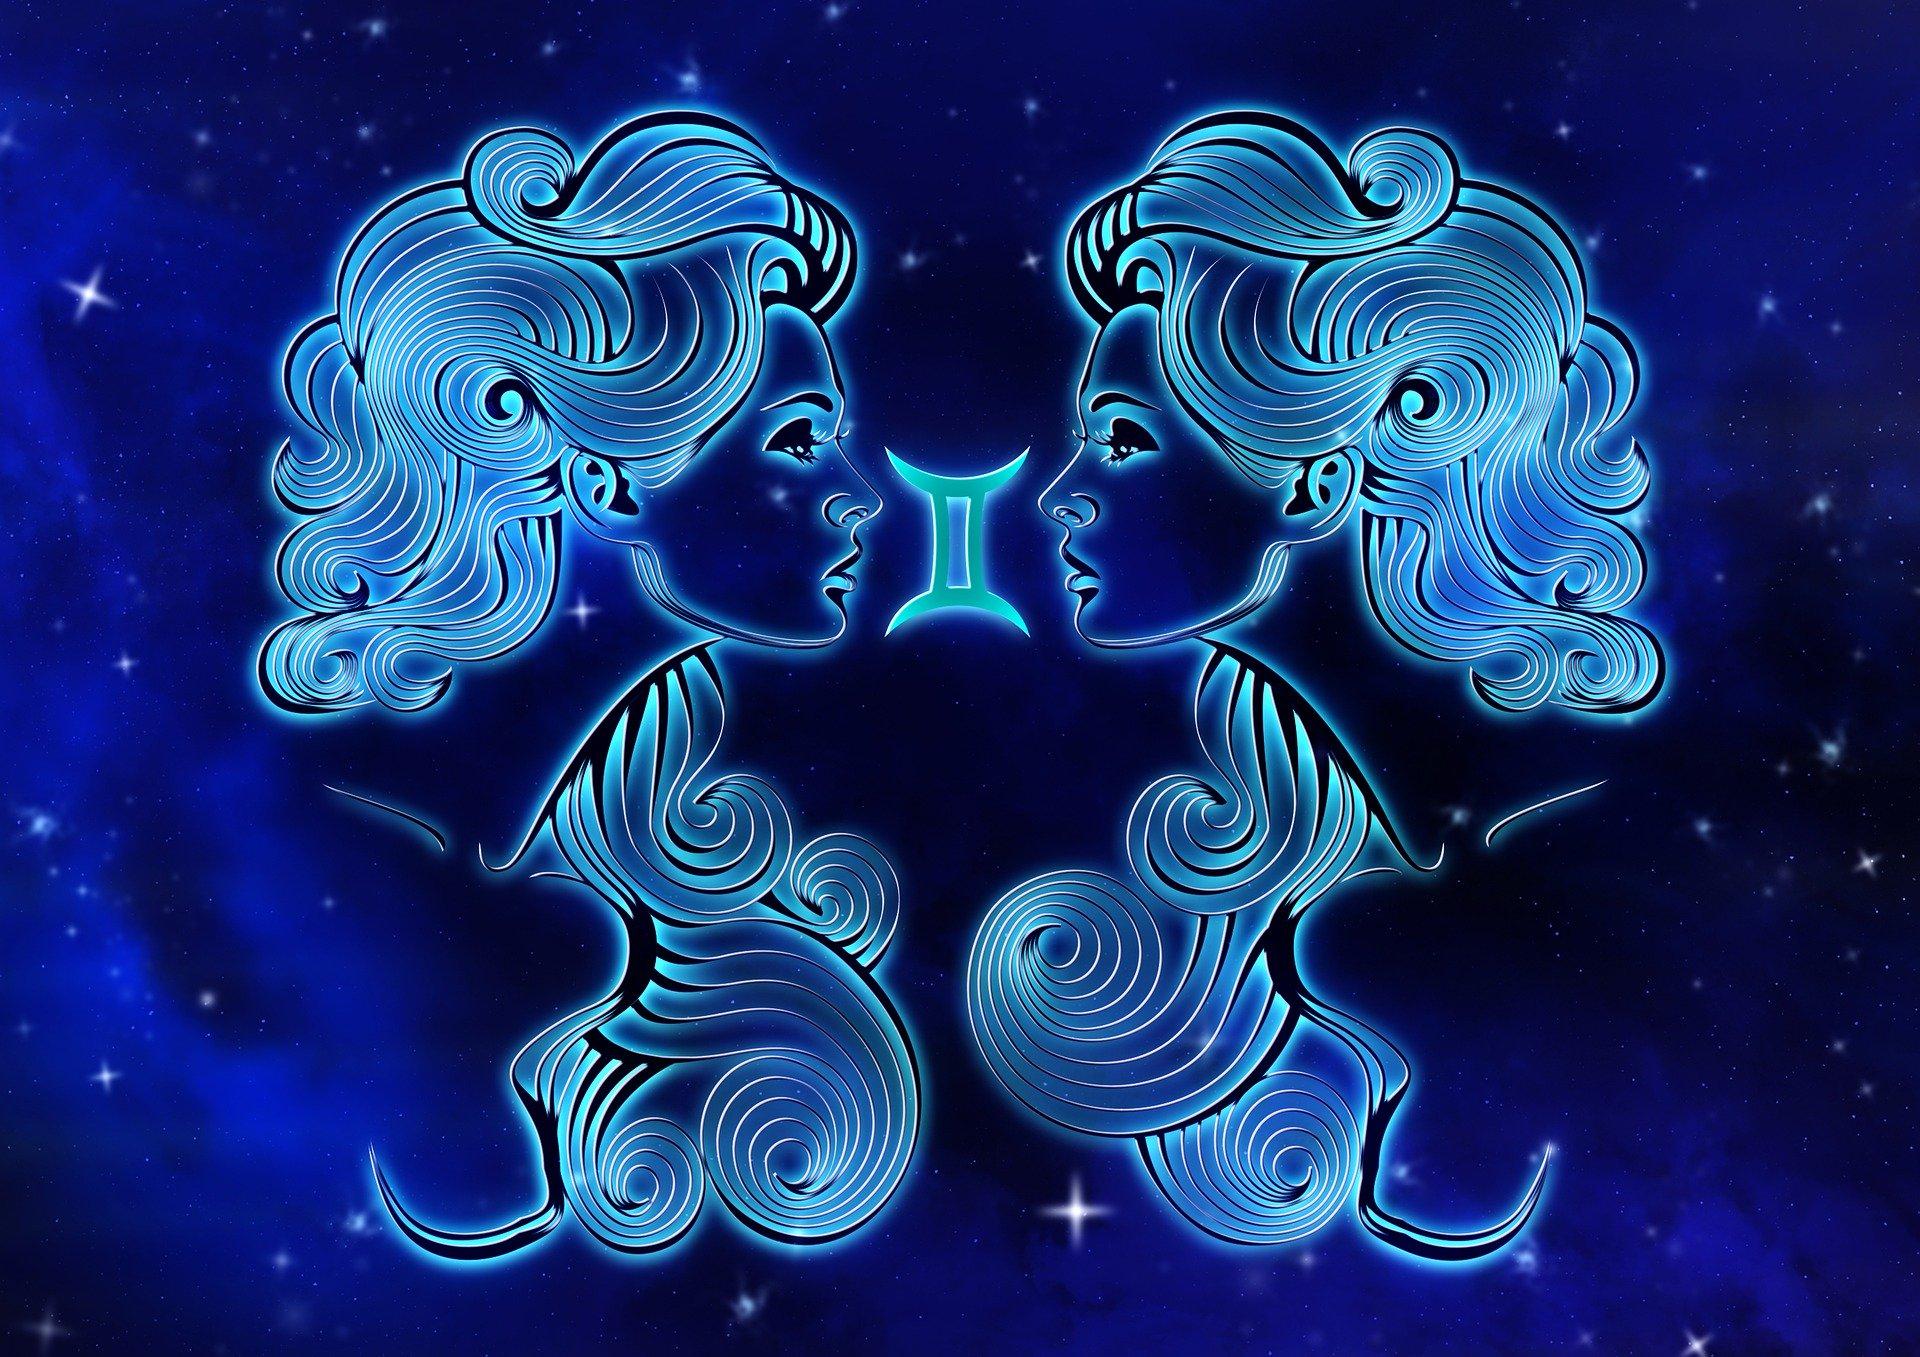 Horoscop anul 2013 Anul Sarpelui de apa - zodia Gemeni